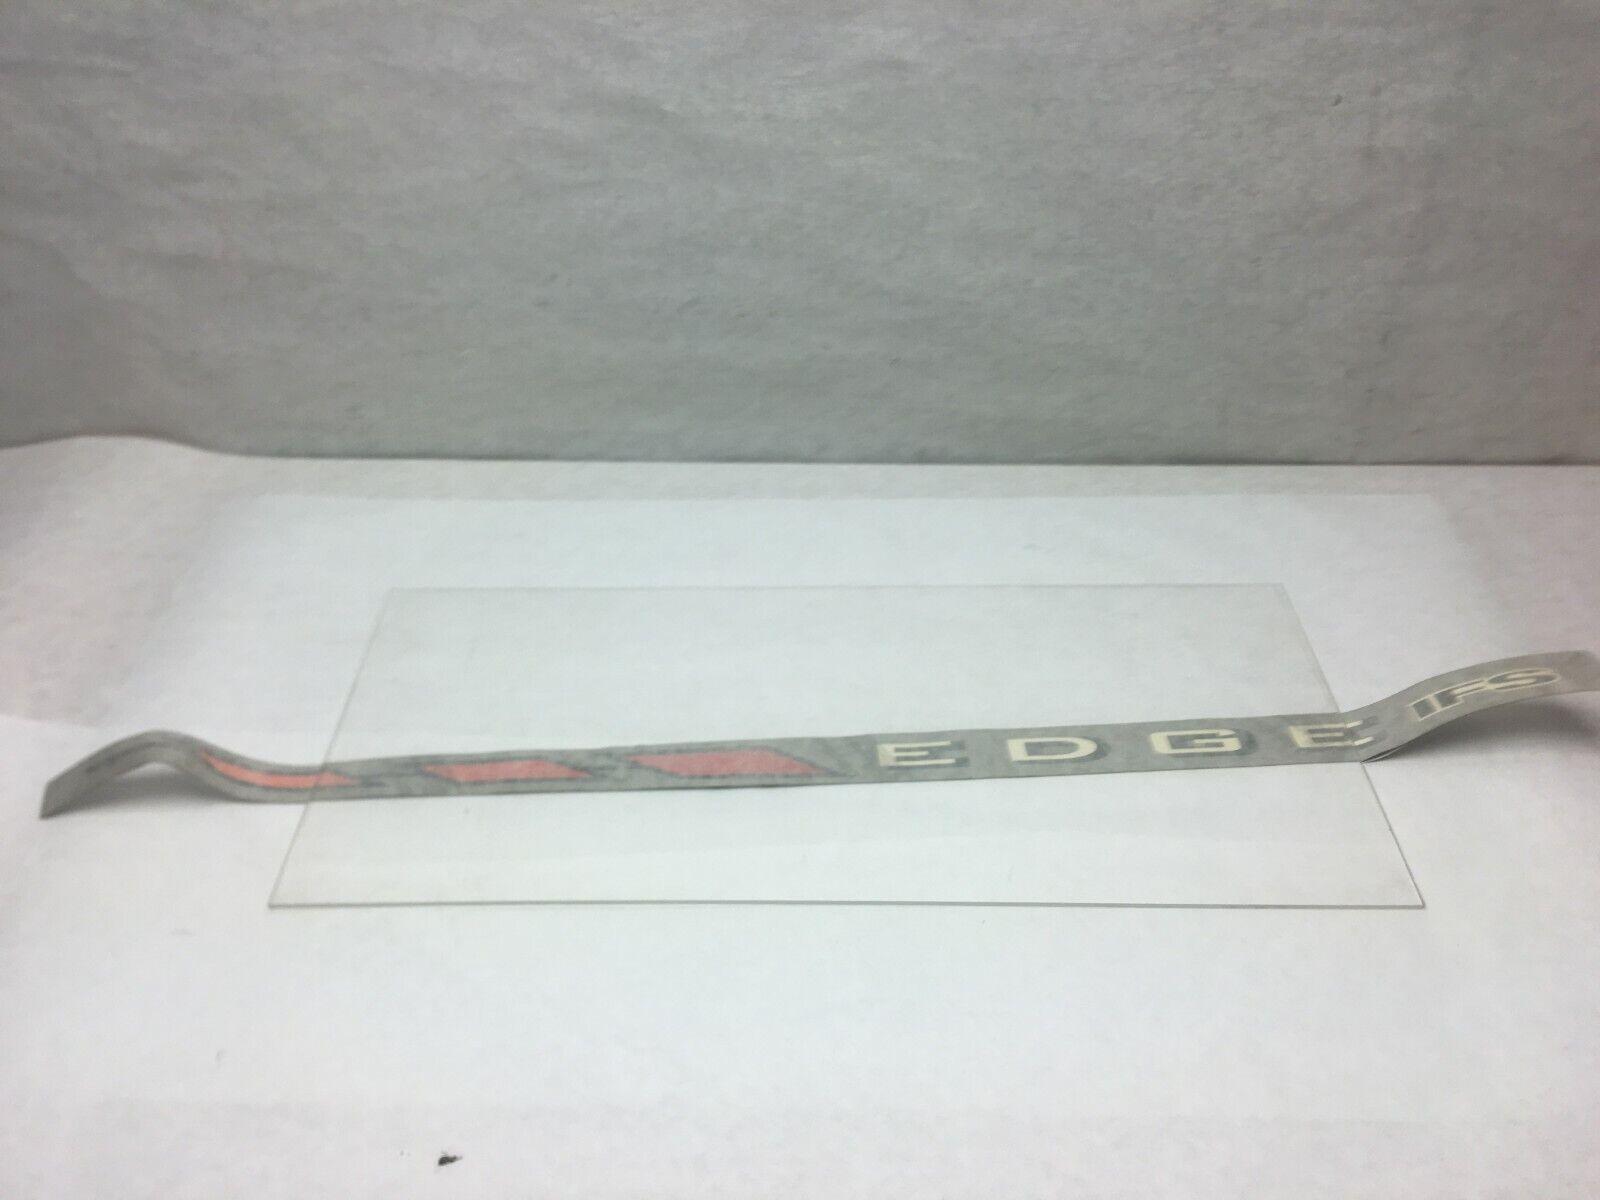 New Polaris Trailing Arm Decal LH 2006 500 7172974